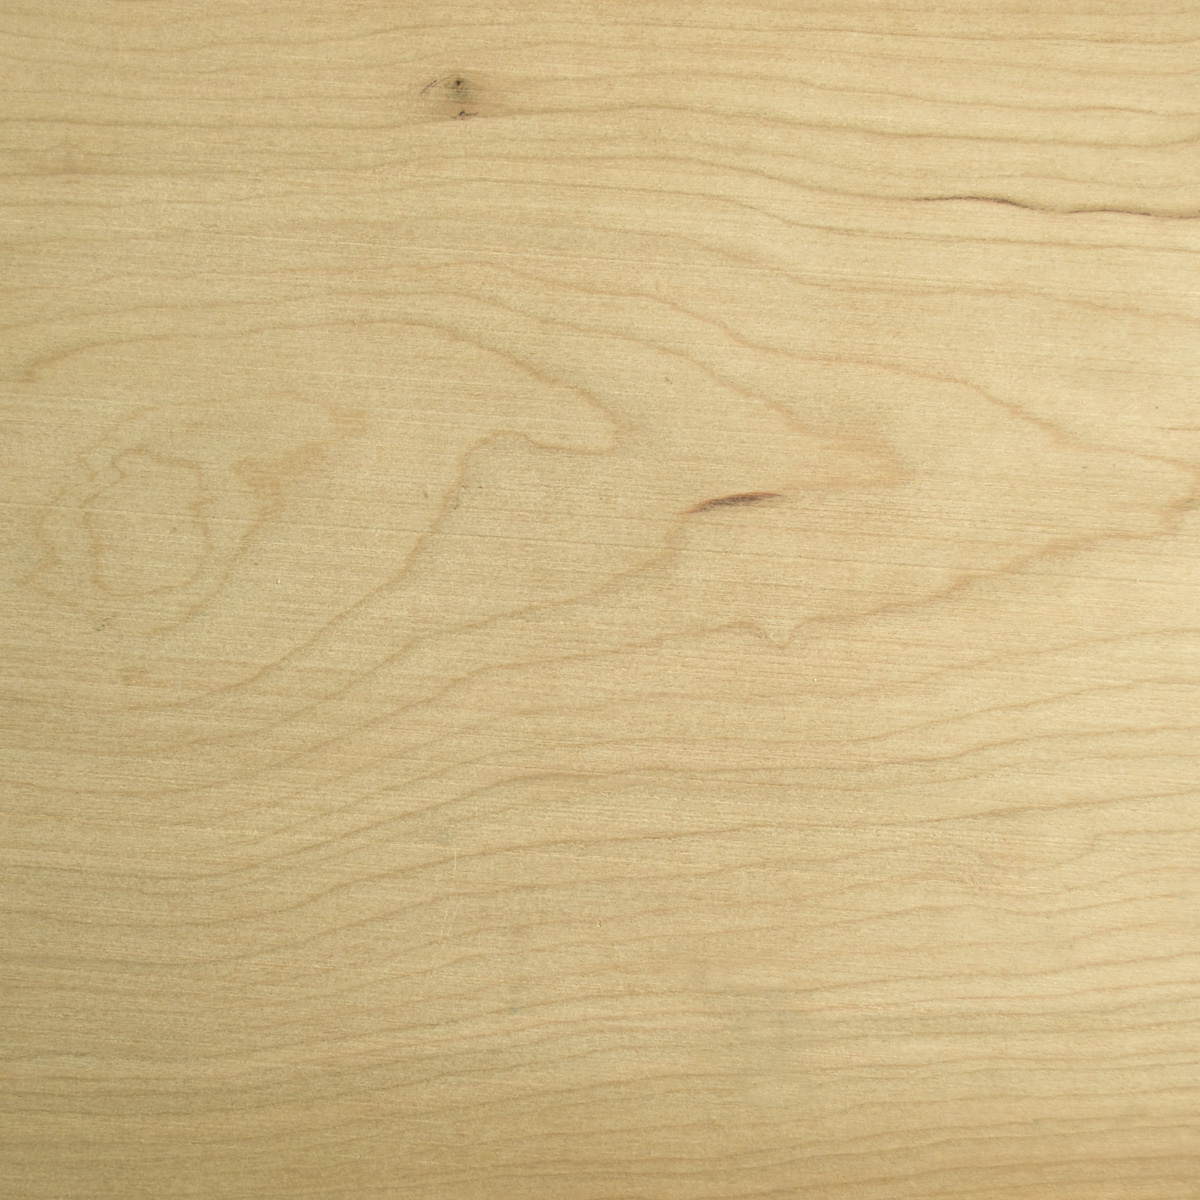 Cherry Wood (close up of wood grain)